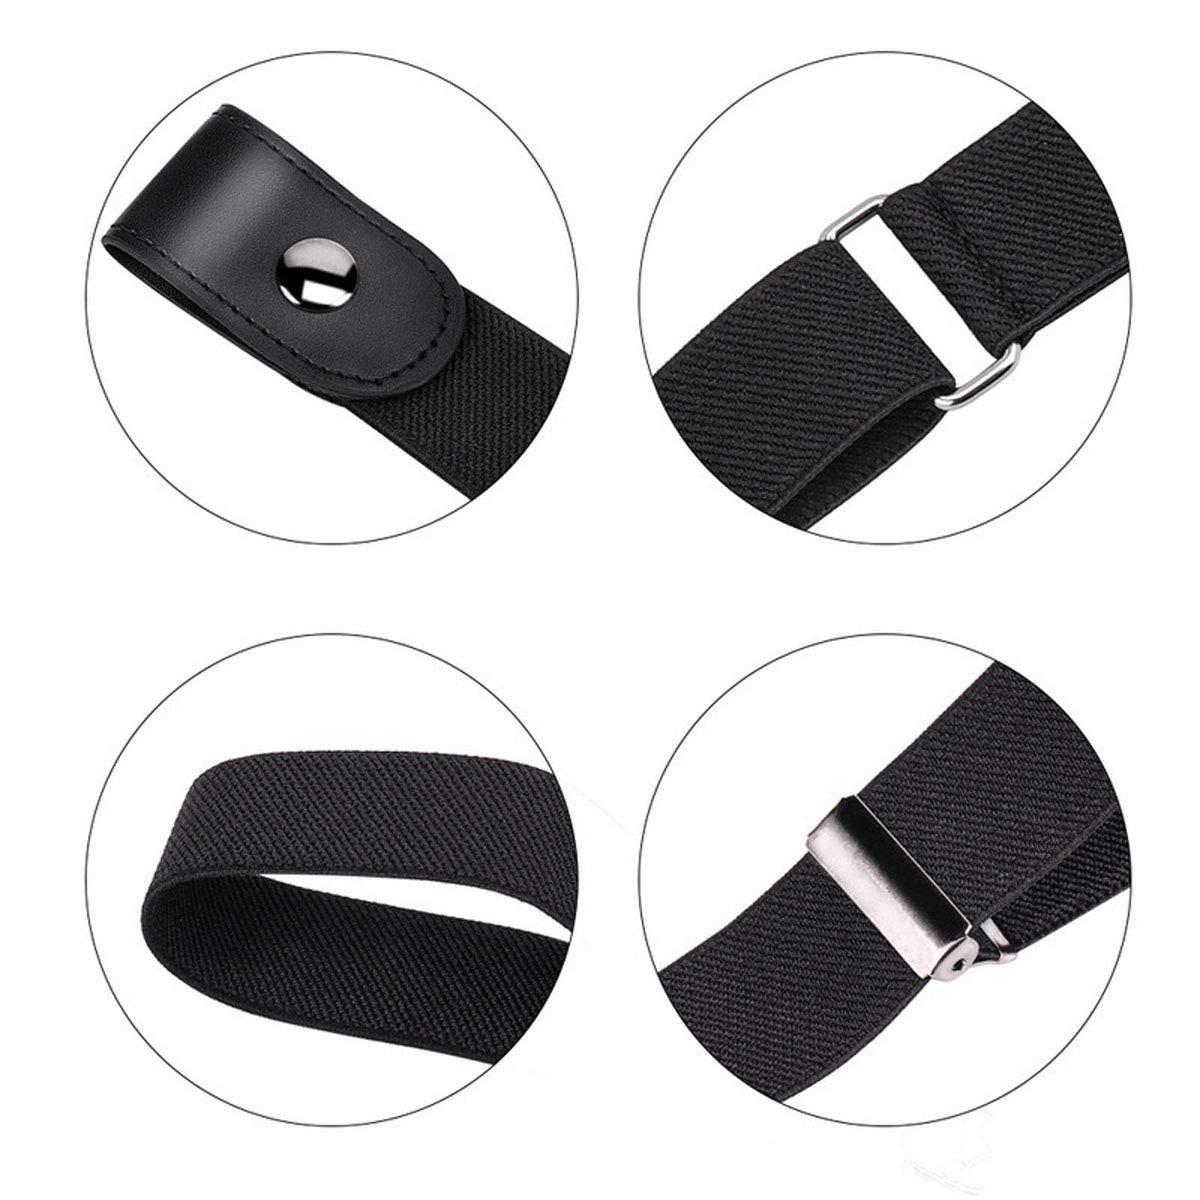 FENICAL Unisex Leather Slim Stretch Invisible Belt Jeans Simple Joker Lazy Belt Buckle Free Stretch Belt Plus Size No Buckle Show Invisible Belt for Jeans Pants Dresses Size 115CM Black